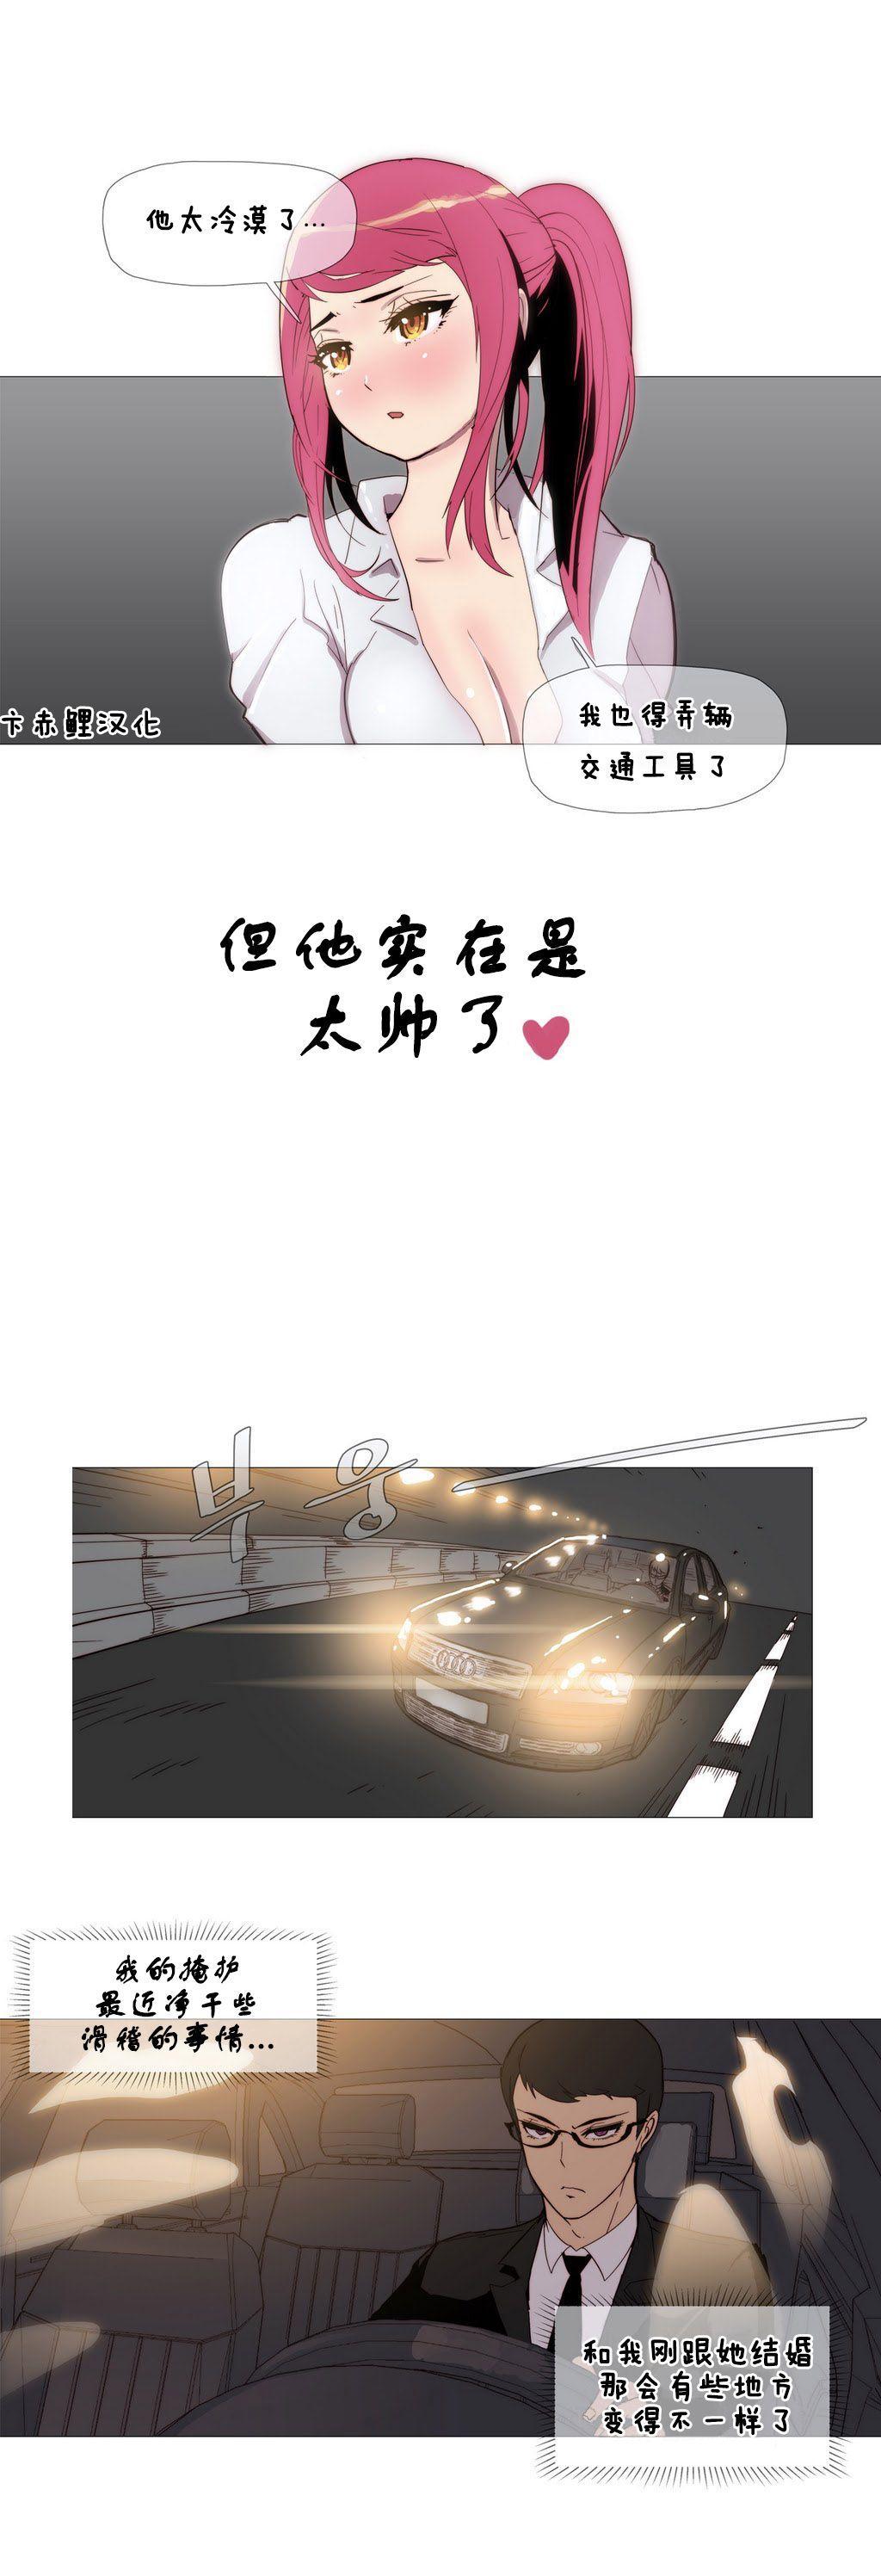 HouseHold Affairs 【卞赤鲤个人汉化】1~33话(持续更新中) 47